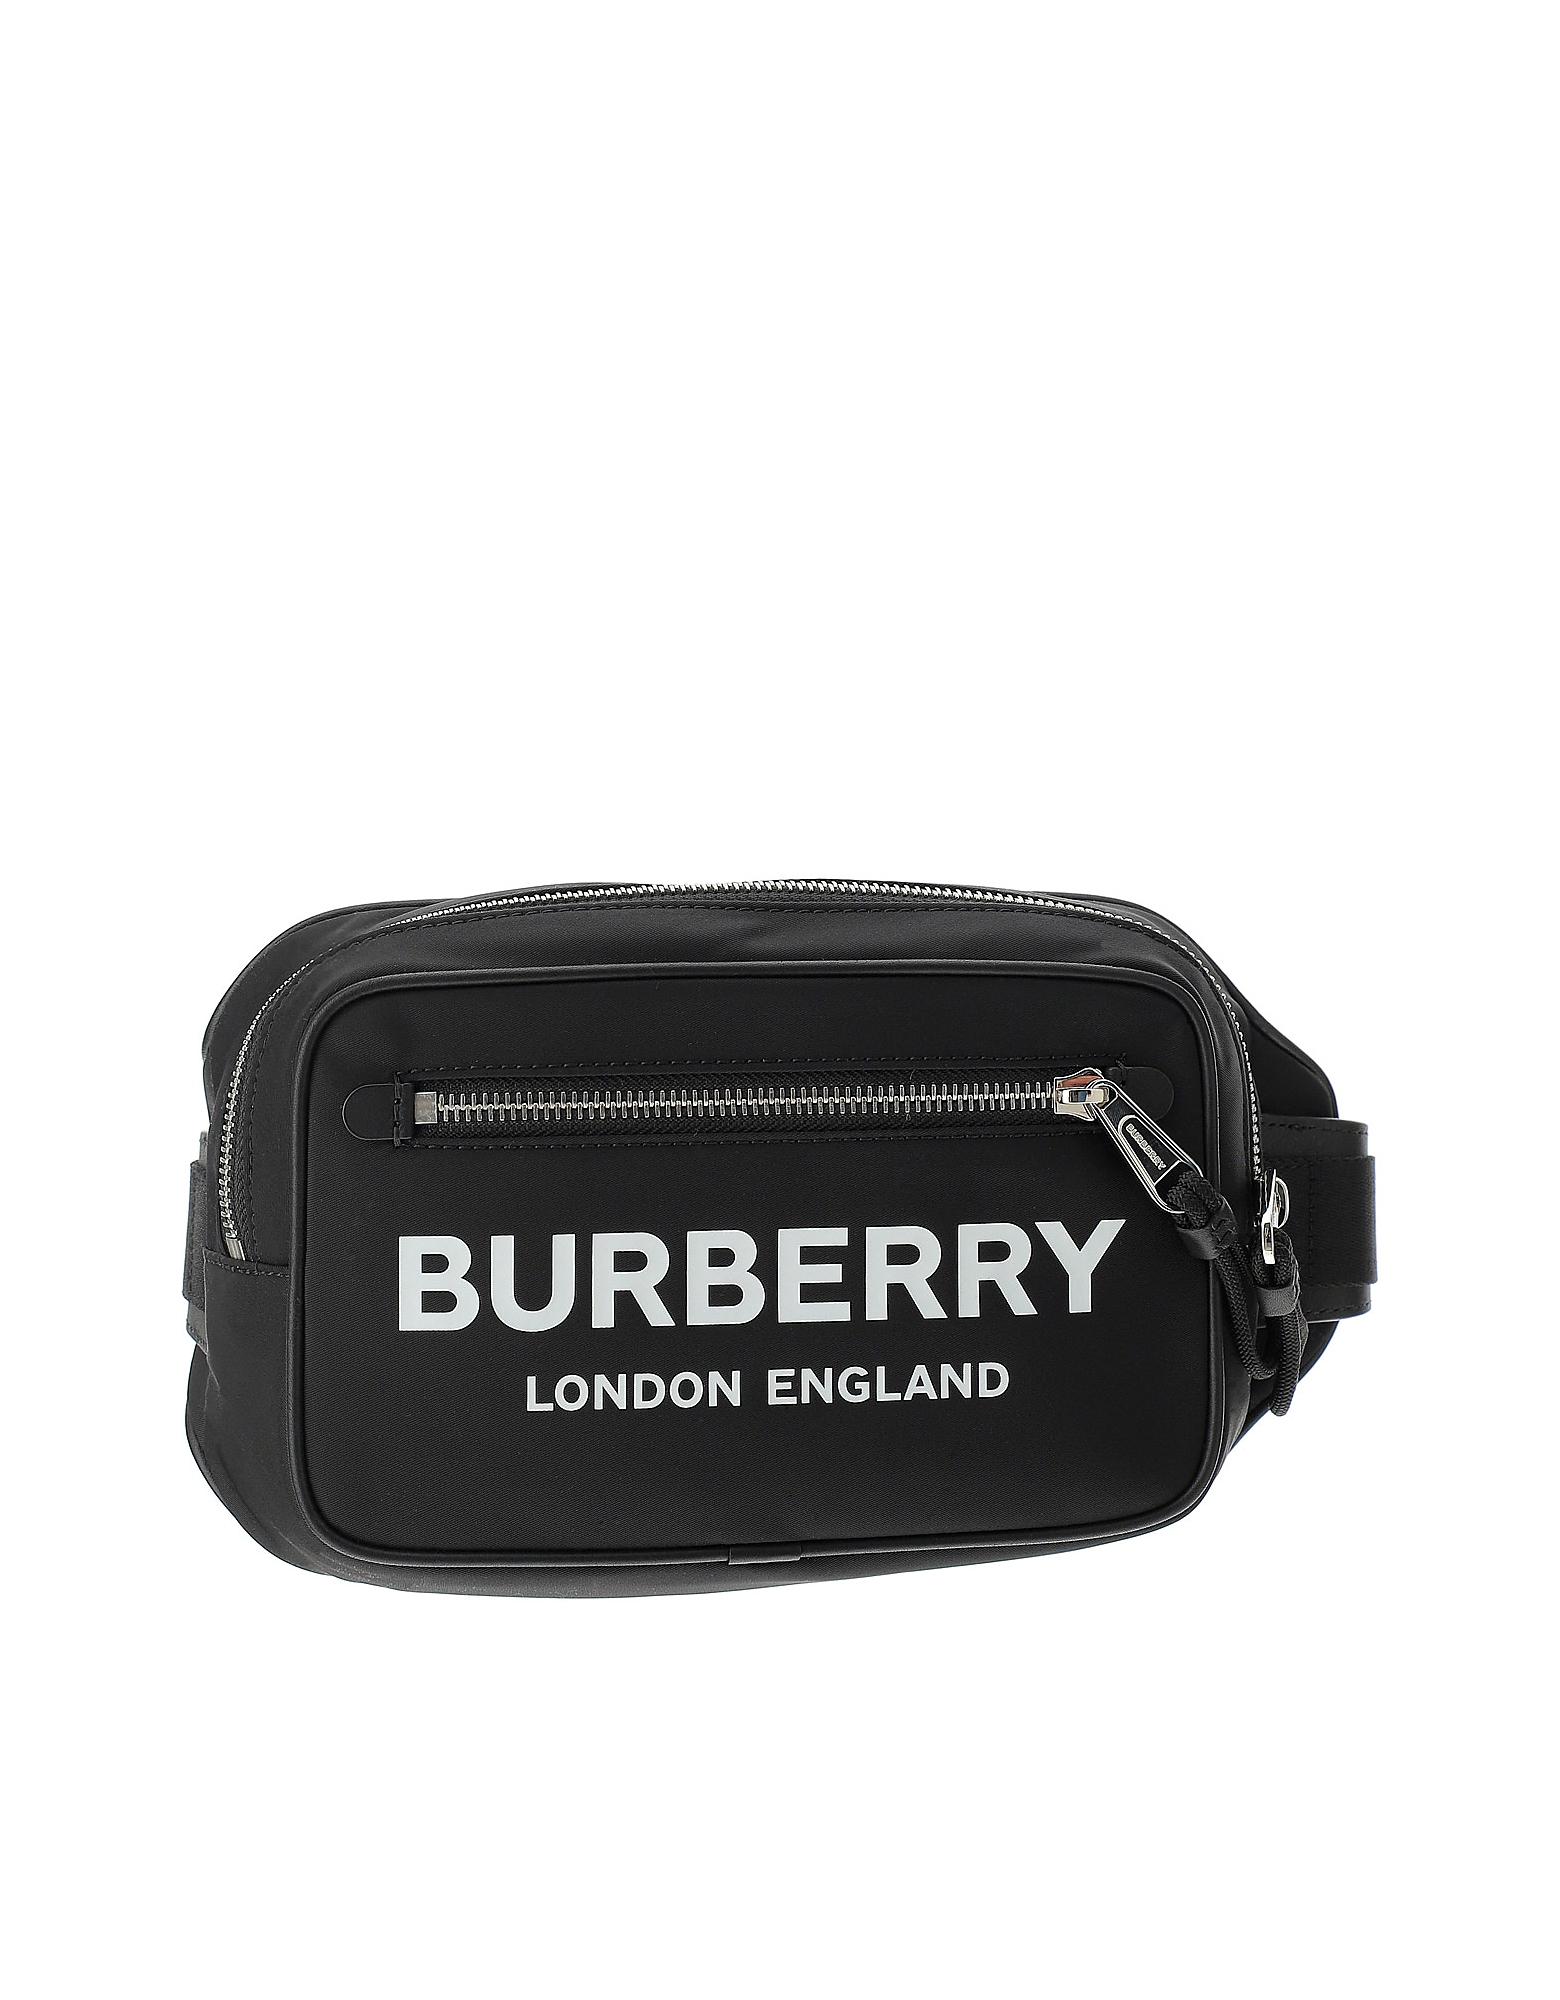 Burberry Designer Men's Bags, Black Signature Fabric Belt Bag